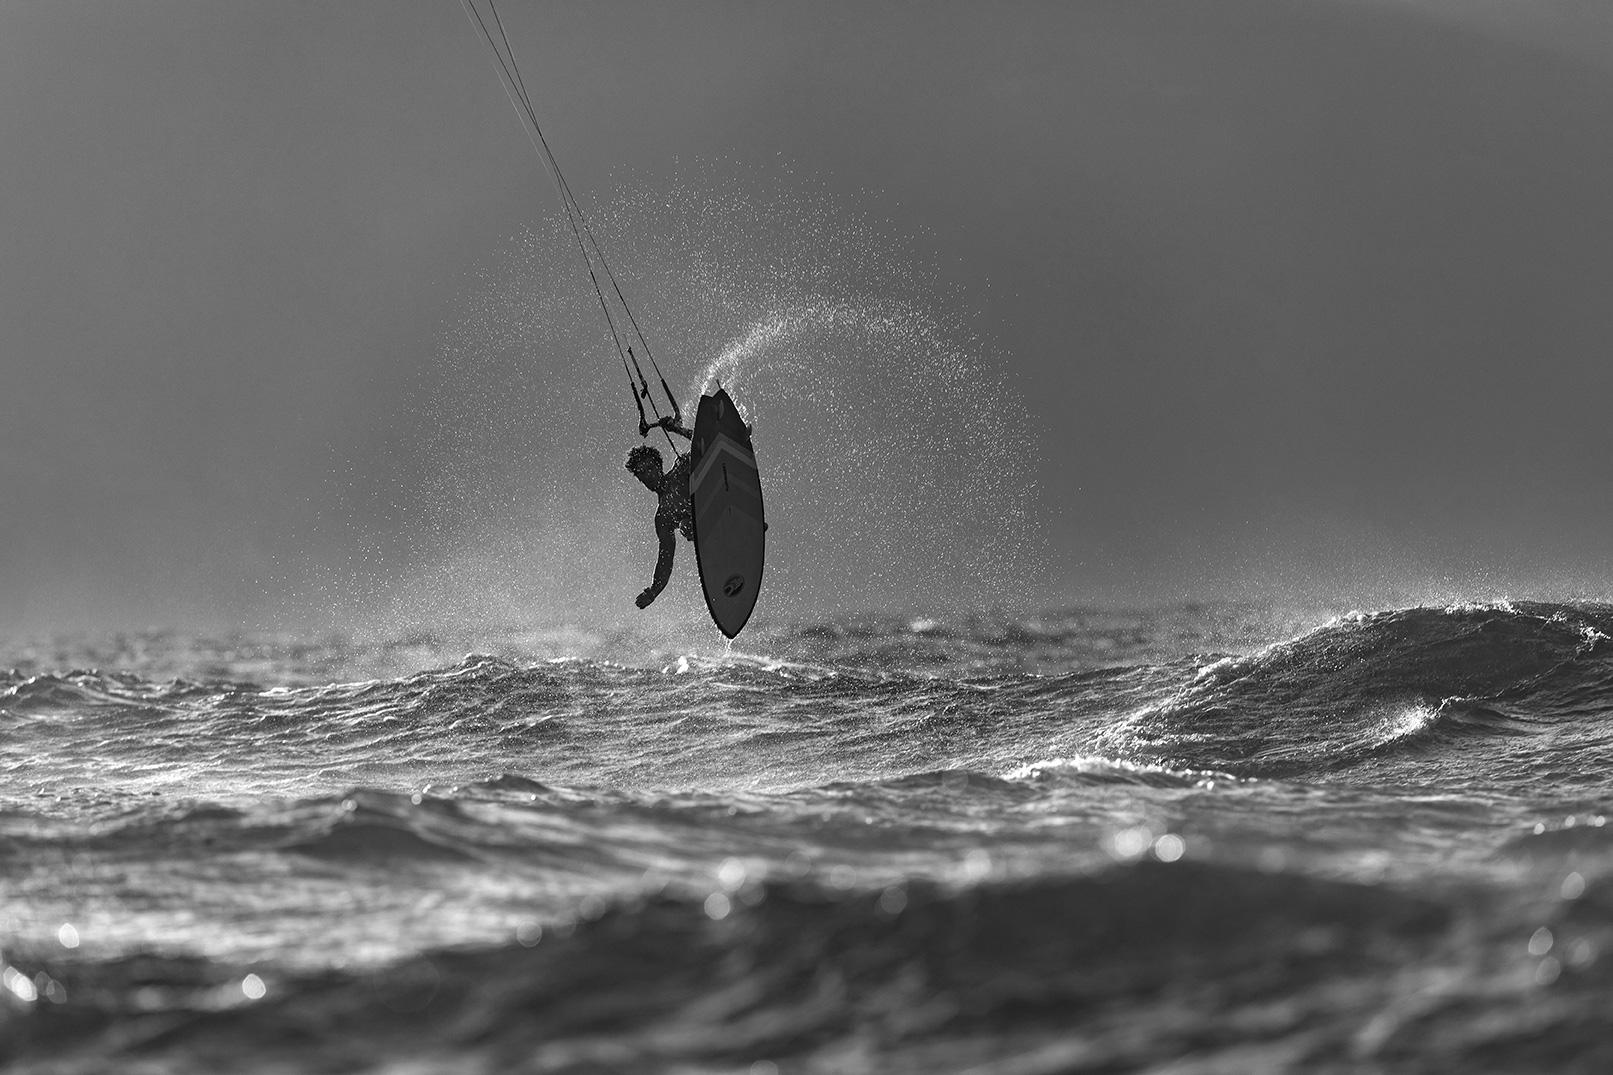 Cabrinha Kites